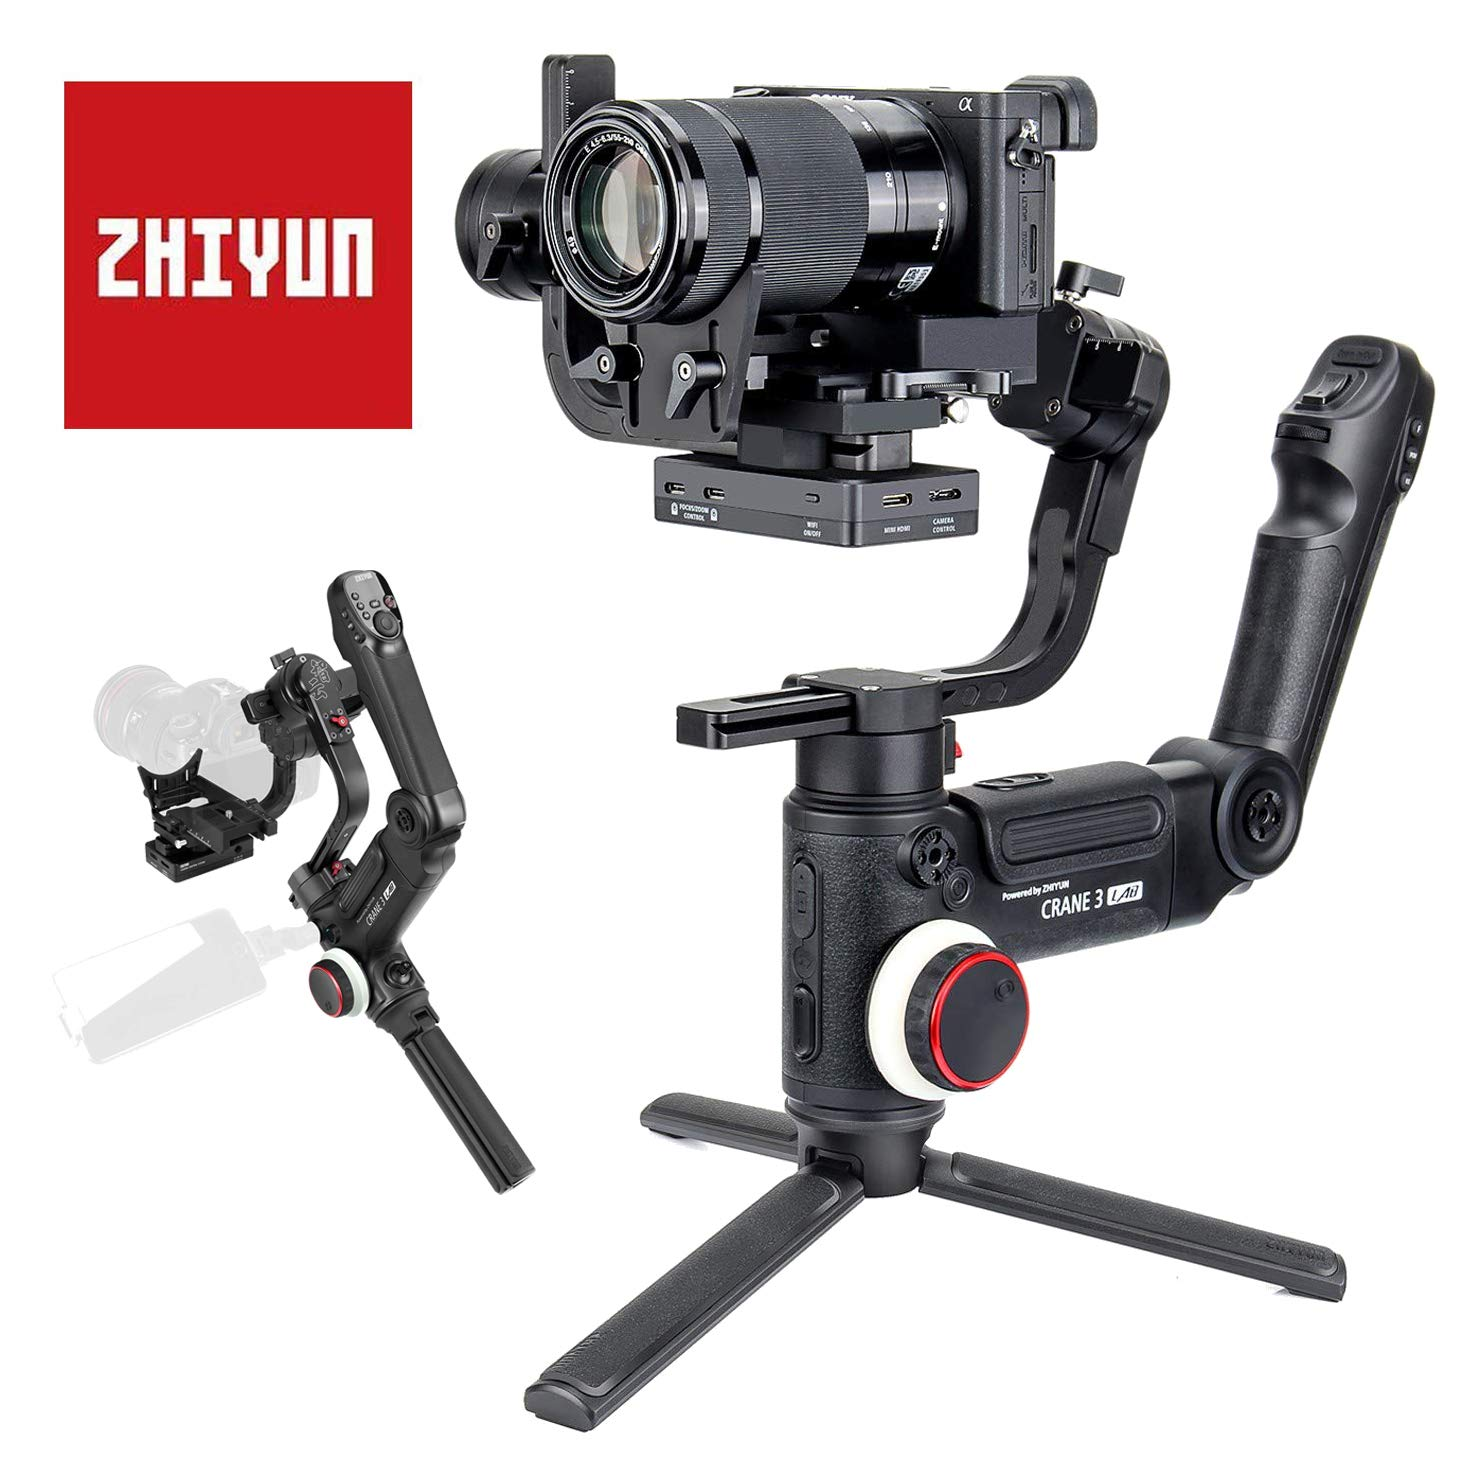 Zhiyun Crane 3 Lab estabilizador Manual de 3 Ejes para cámara ...